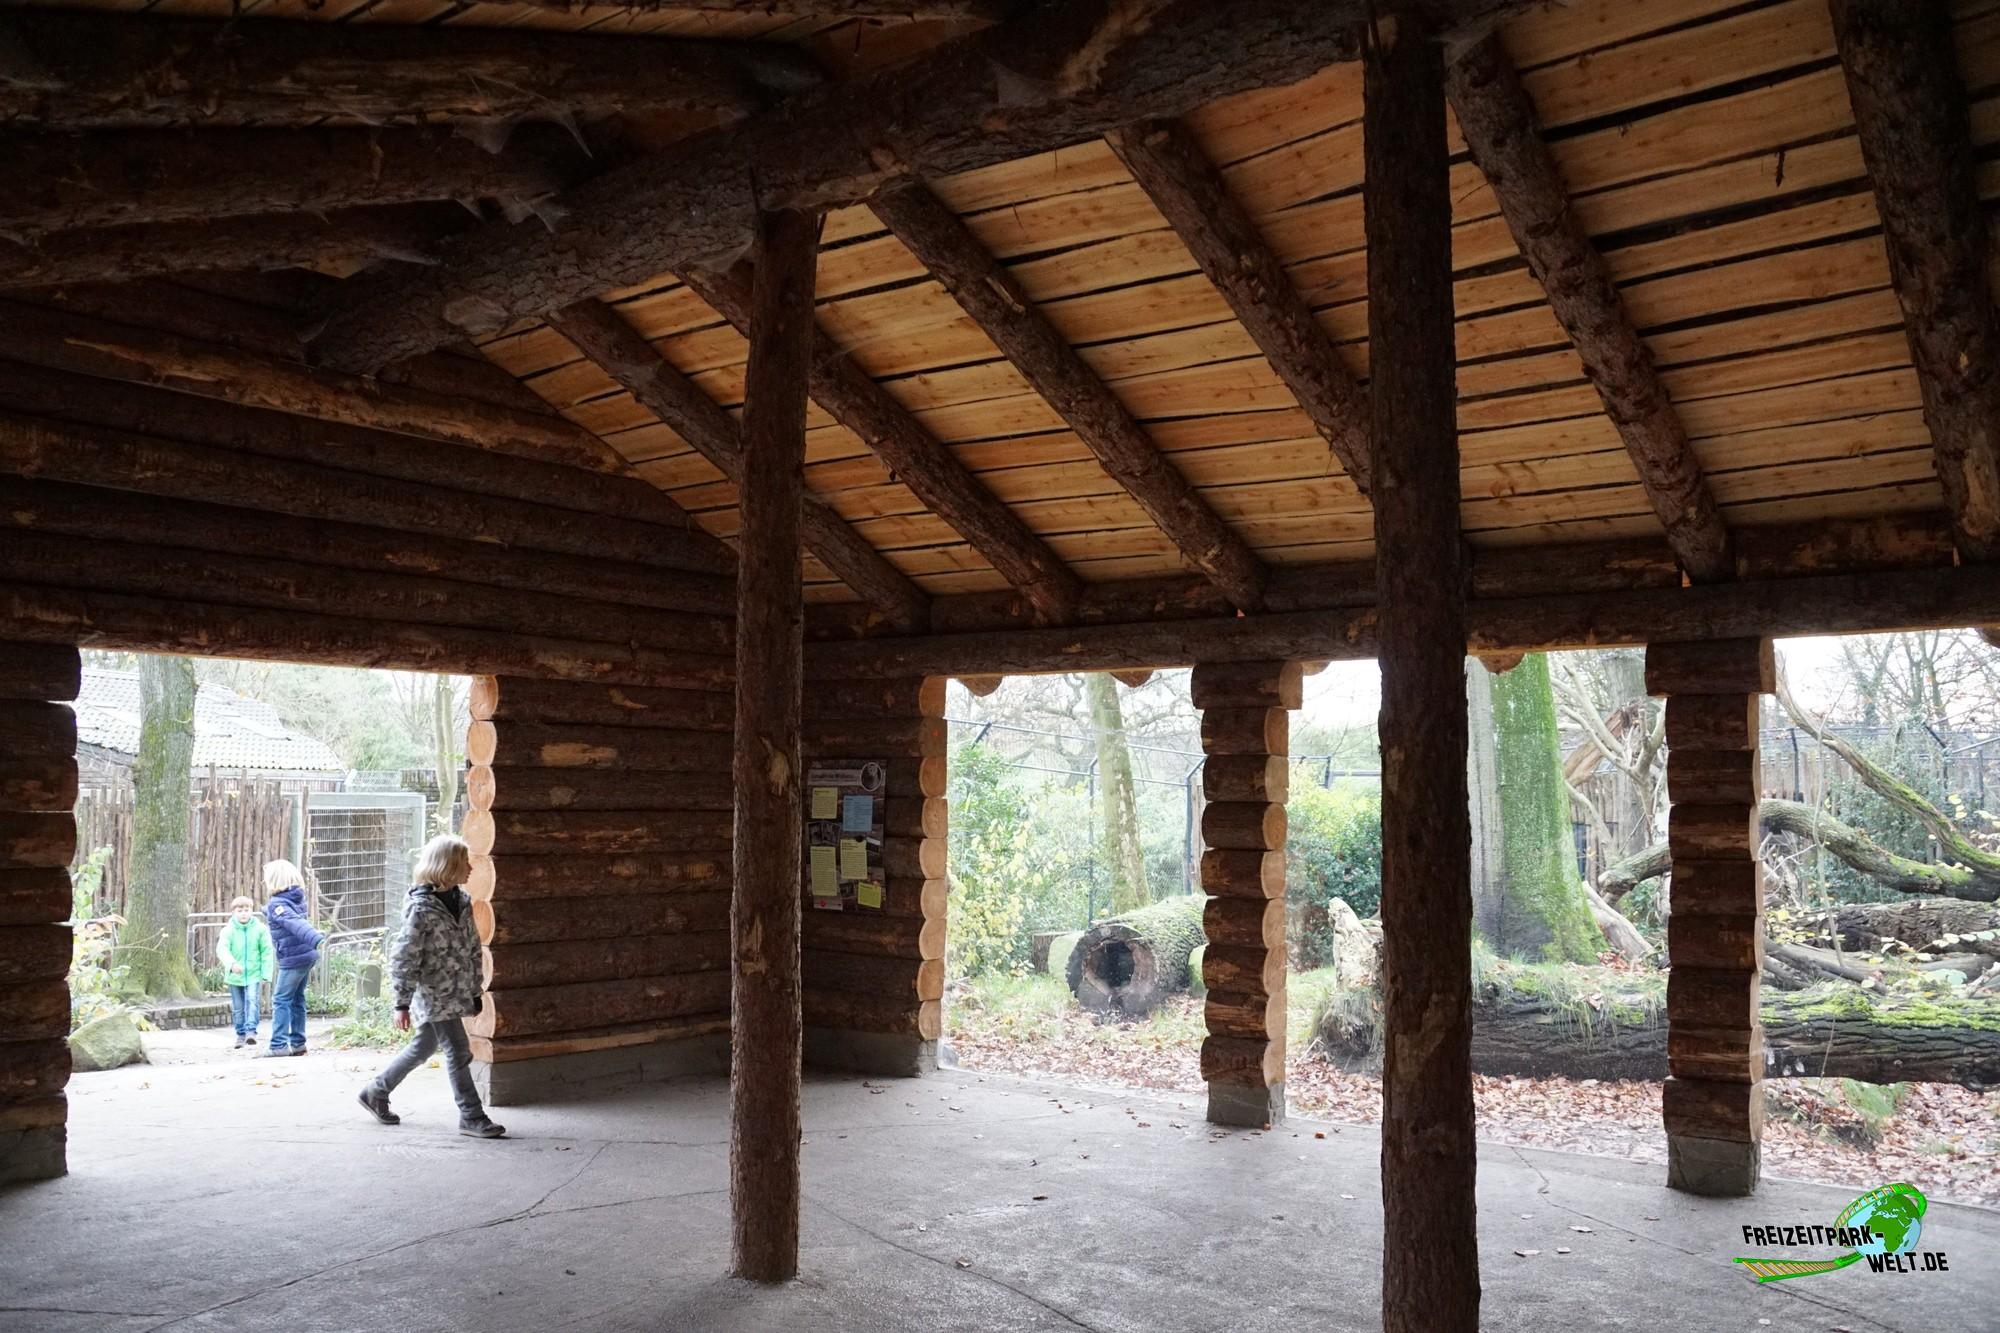 luchs zoo duisburg freizeitpark. Black Bedroom Furniture Sets. Home Design Ideas